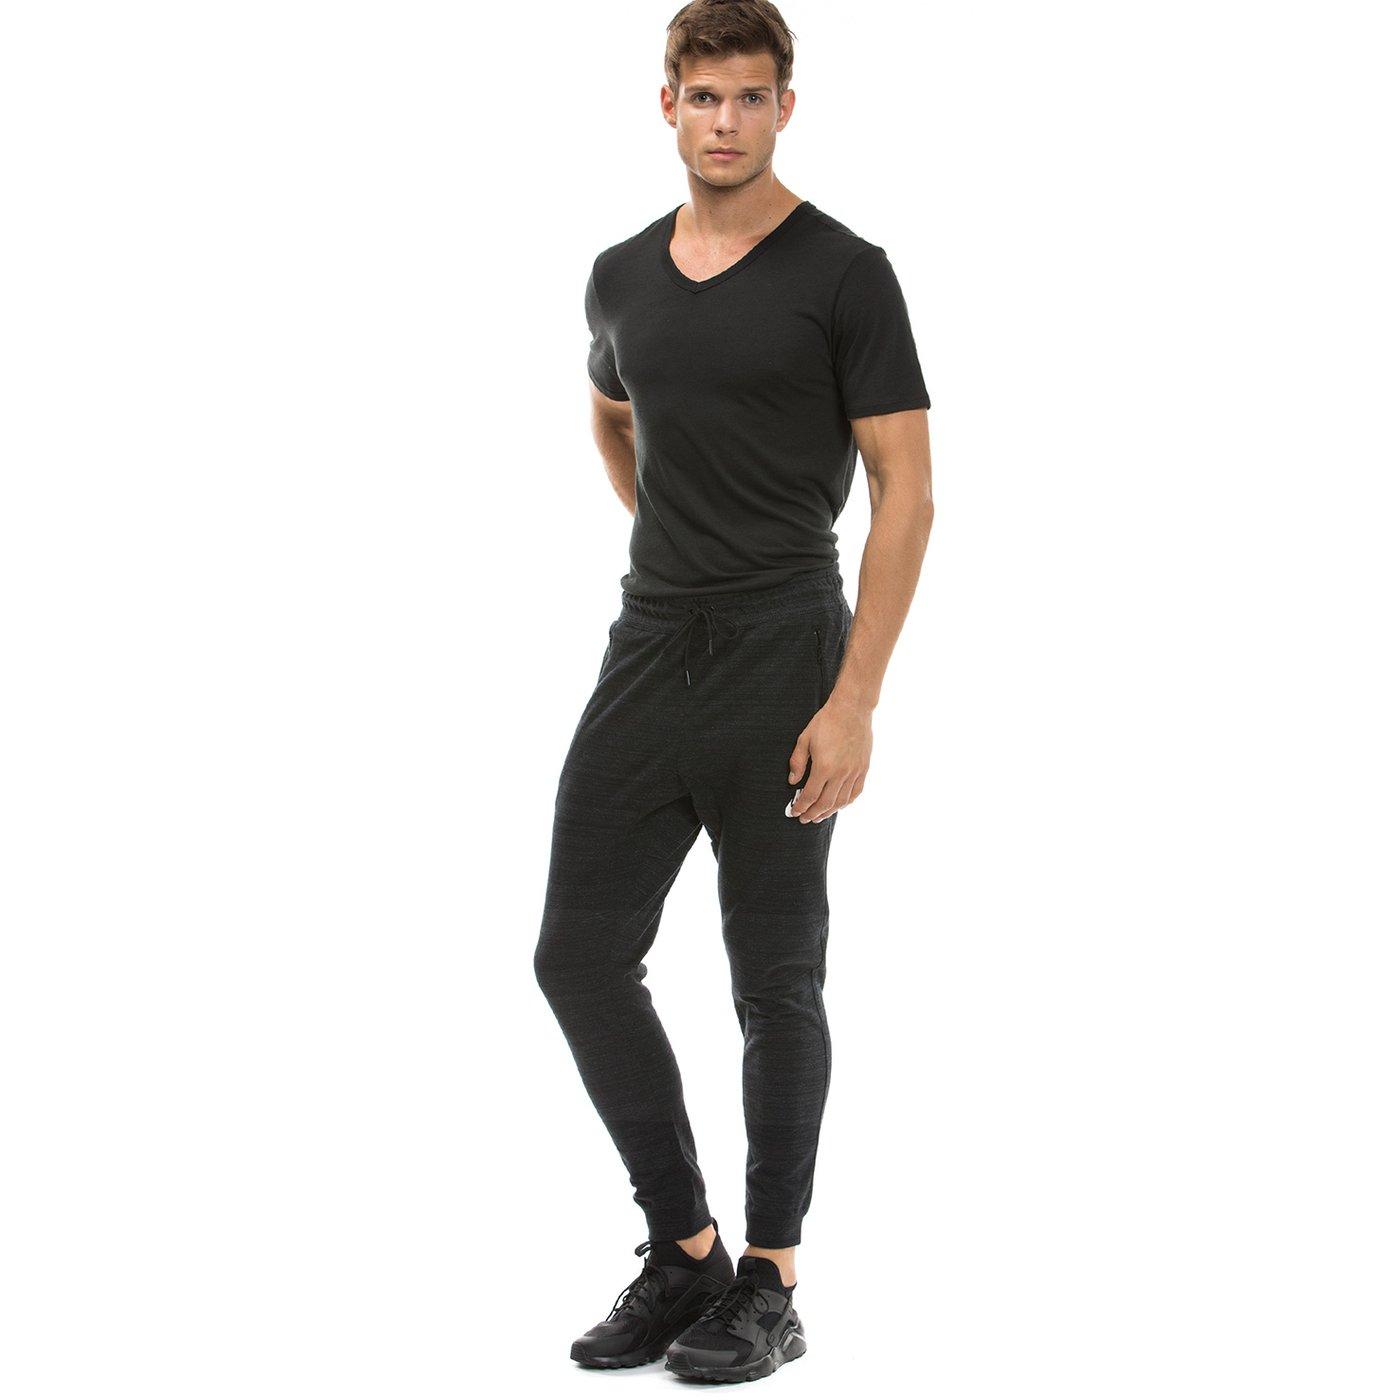 Nike Nsw Av15 Jggr Flc Erkek Siyah Eşofman Altı